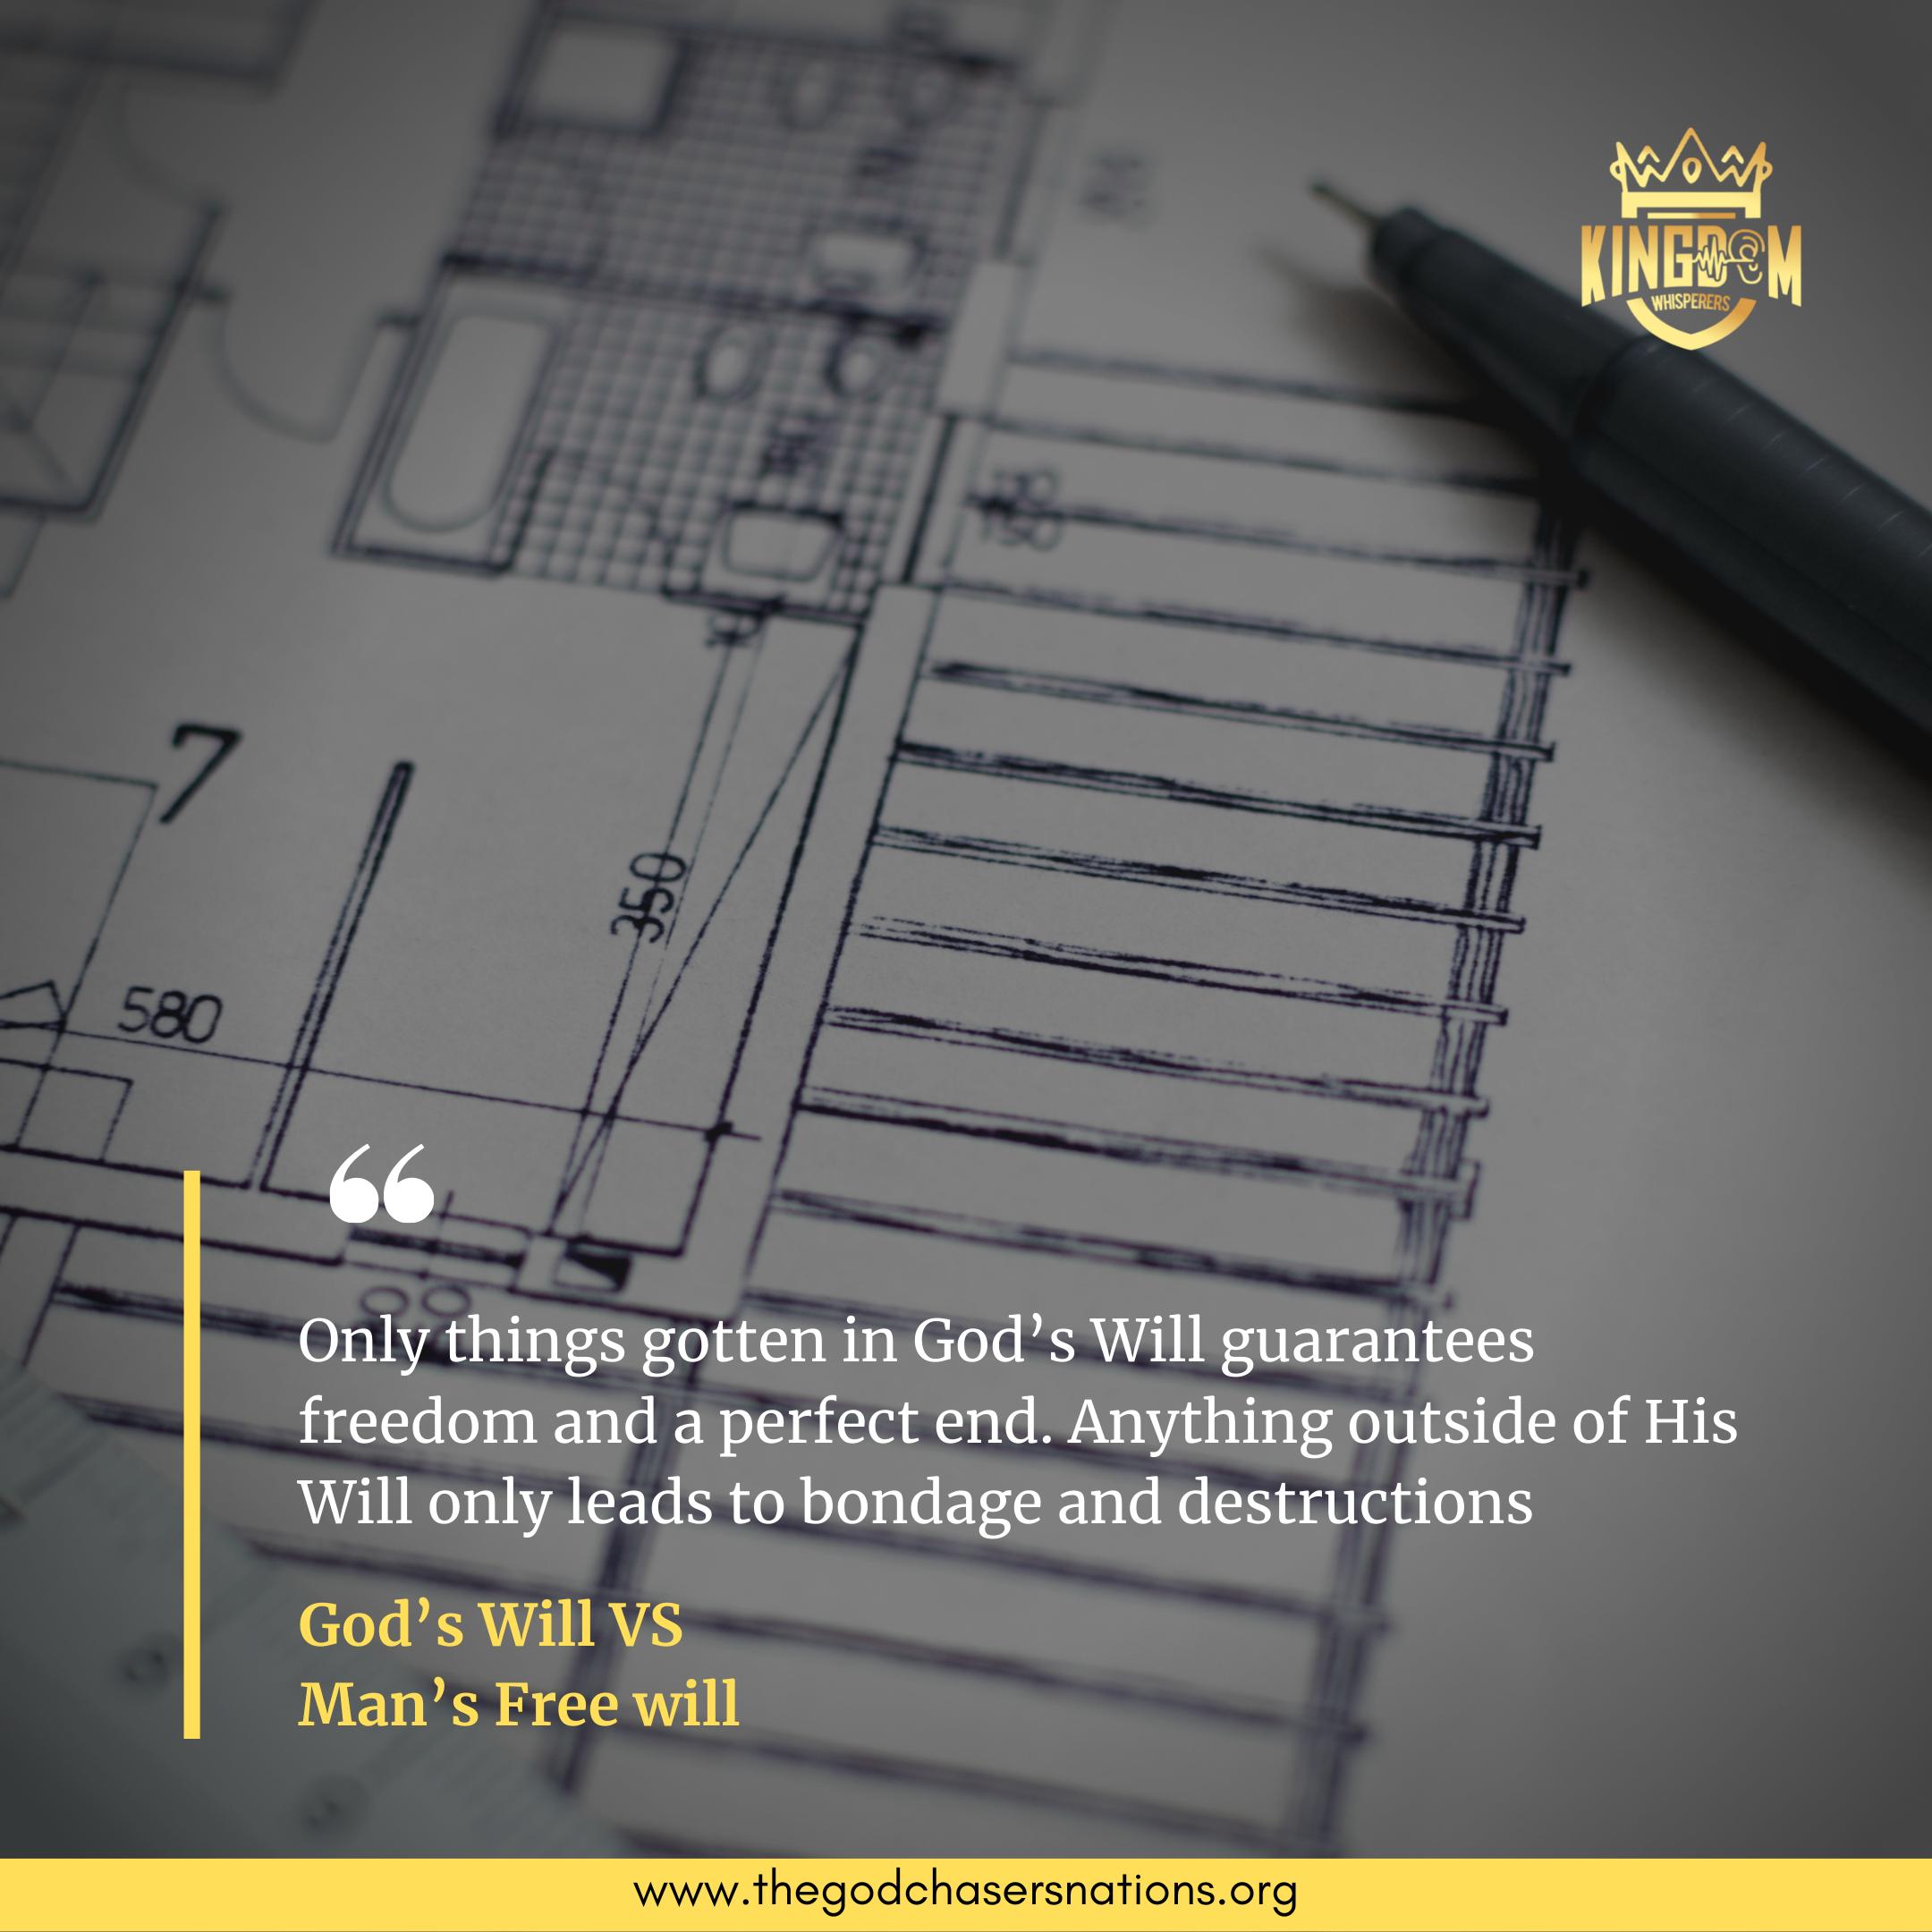 God's Will VS Man's Free will Part 1 series